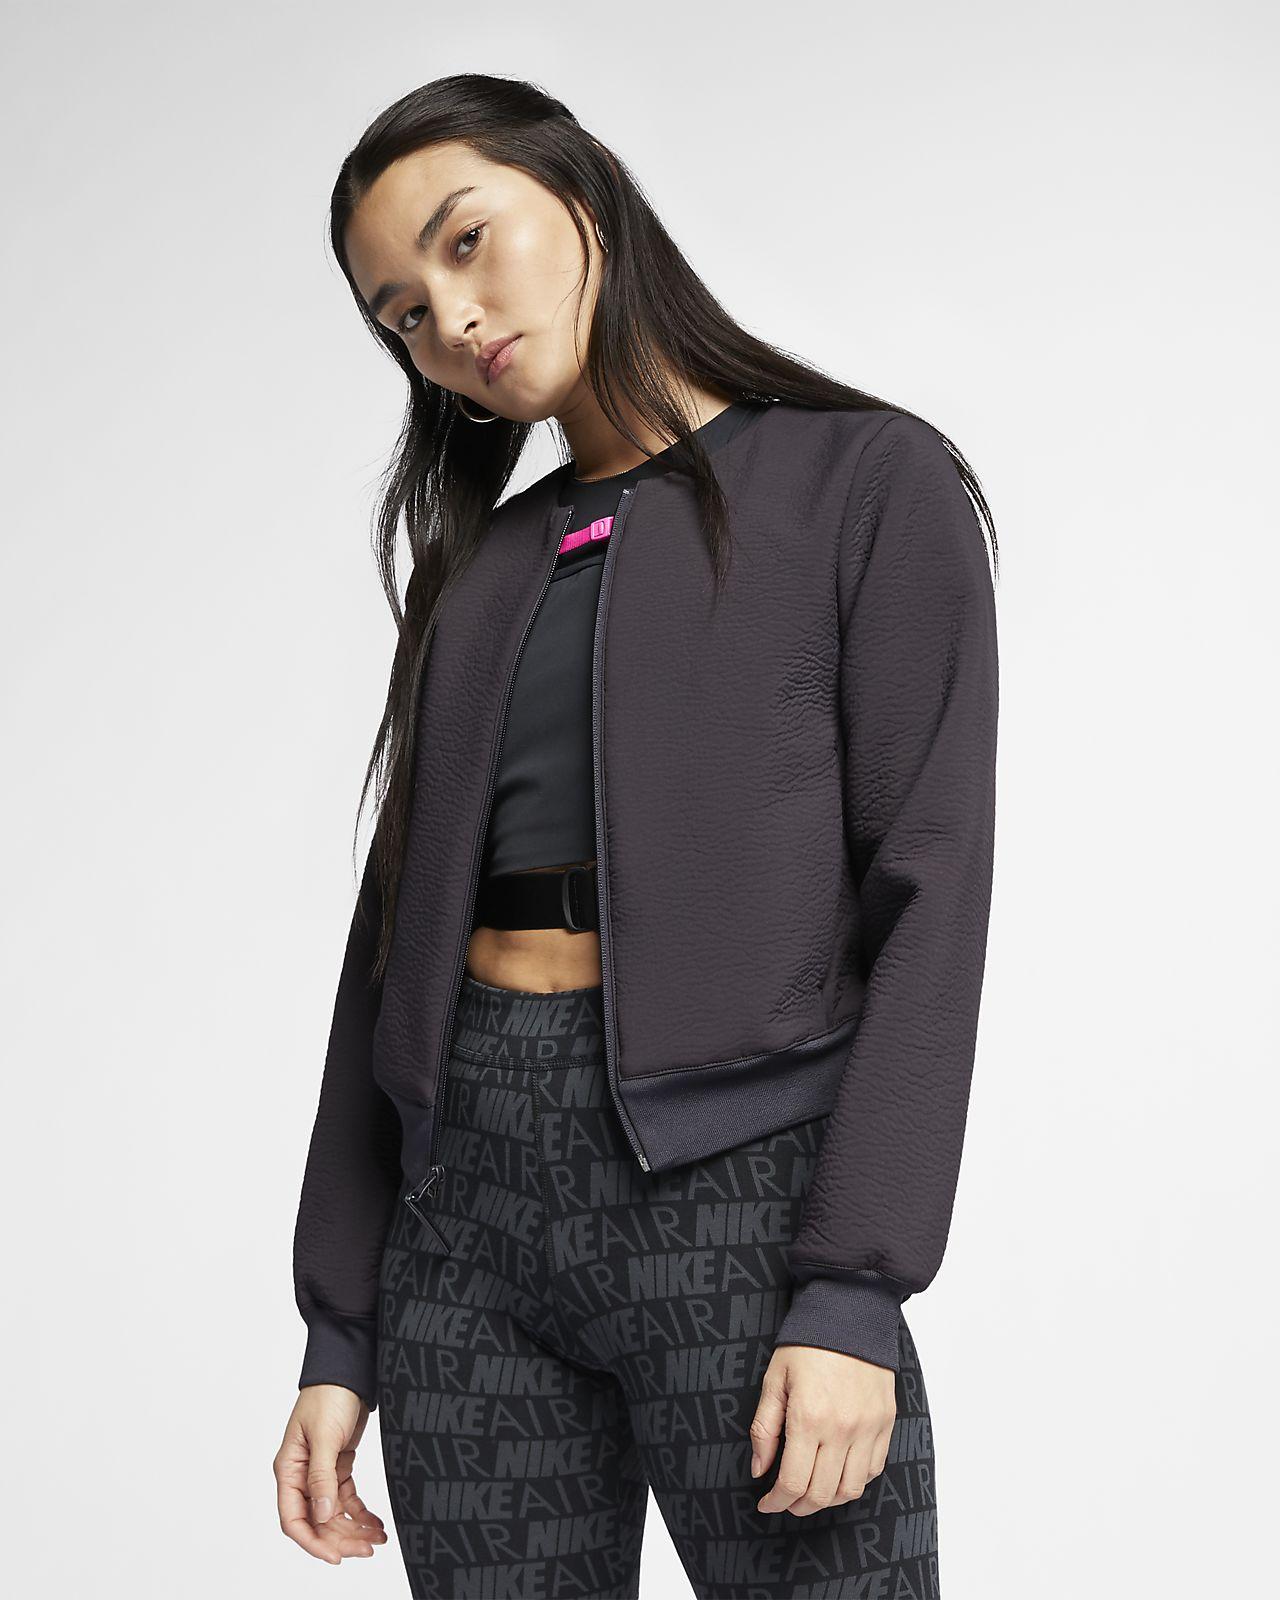 0b76cf32 Nike Sportswear Tech Pack jakke med glidelås til dame. Nike.com NO